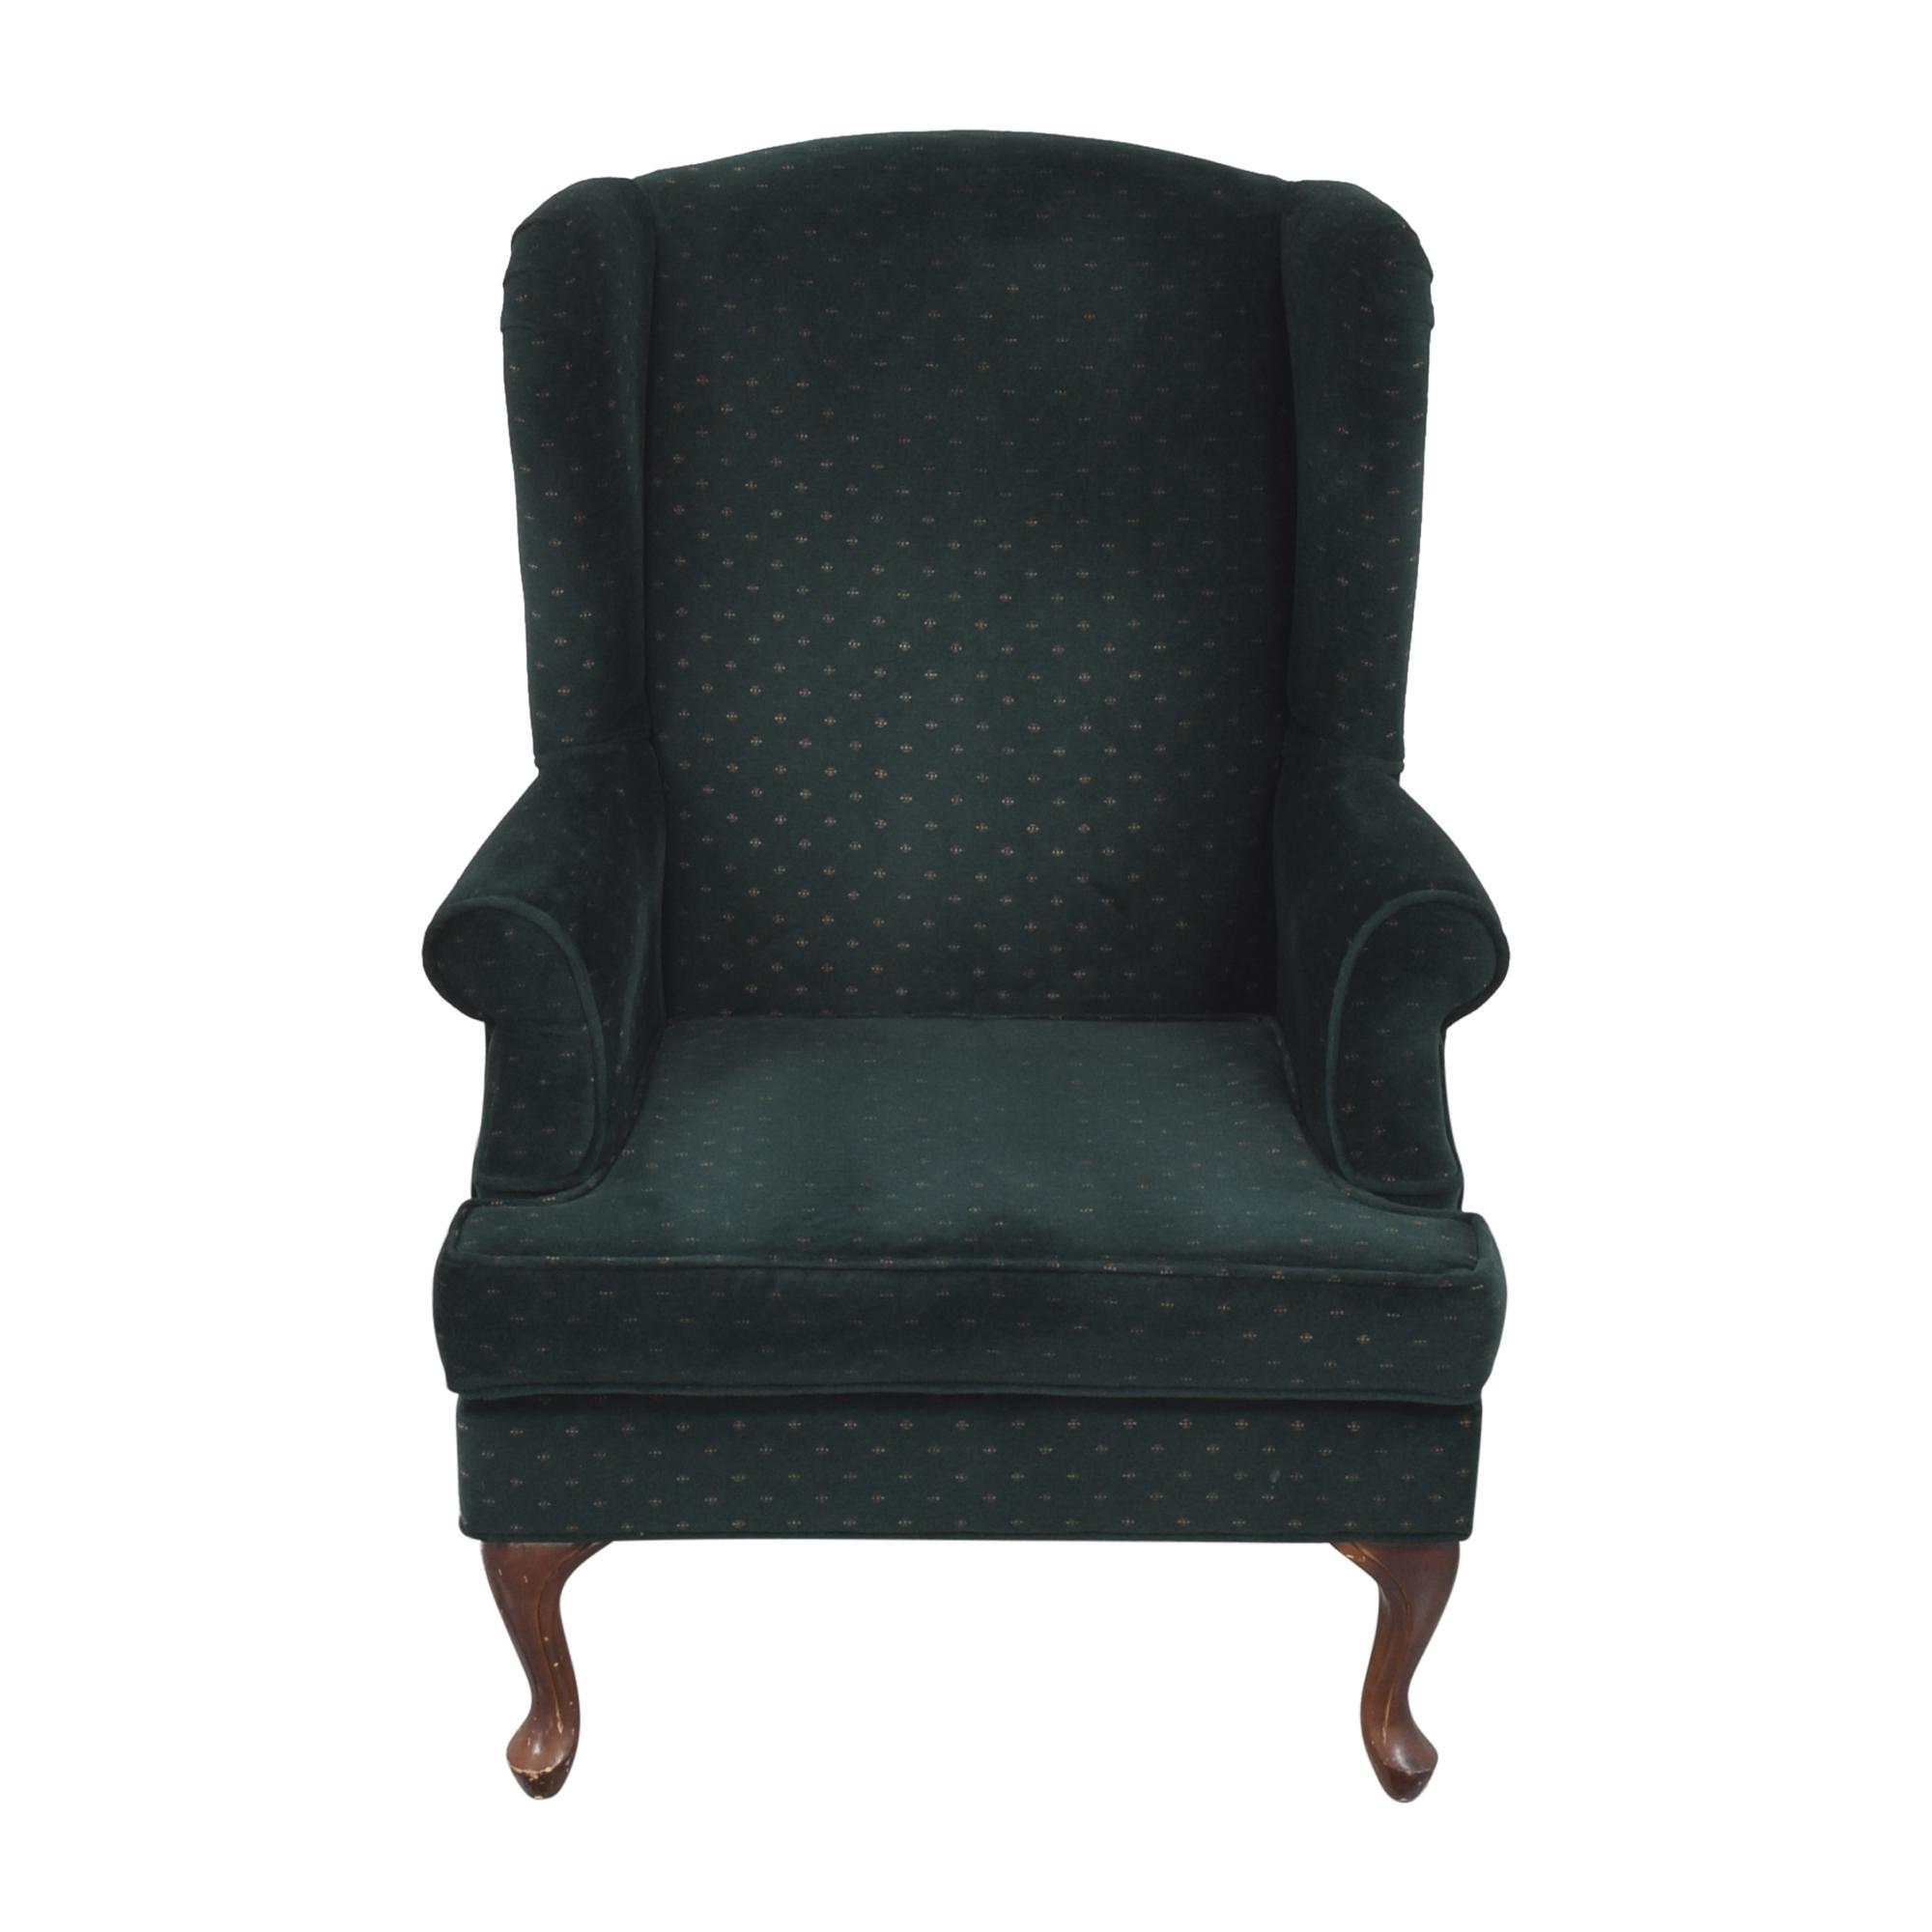 Ethan Allen Ethan Allen Wingback Arm Chair ma